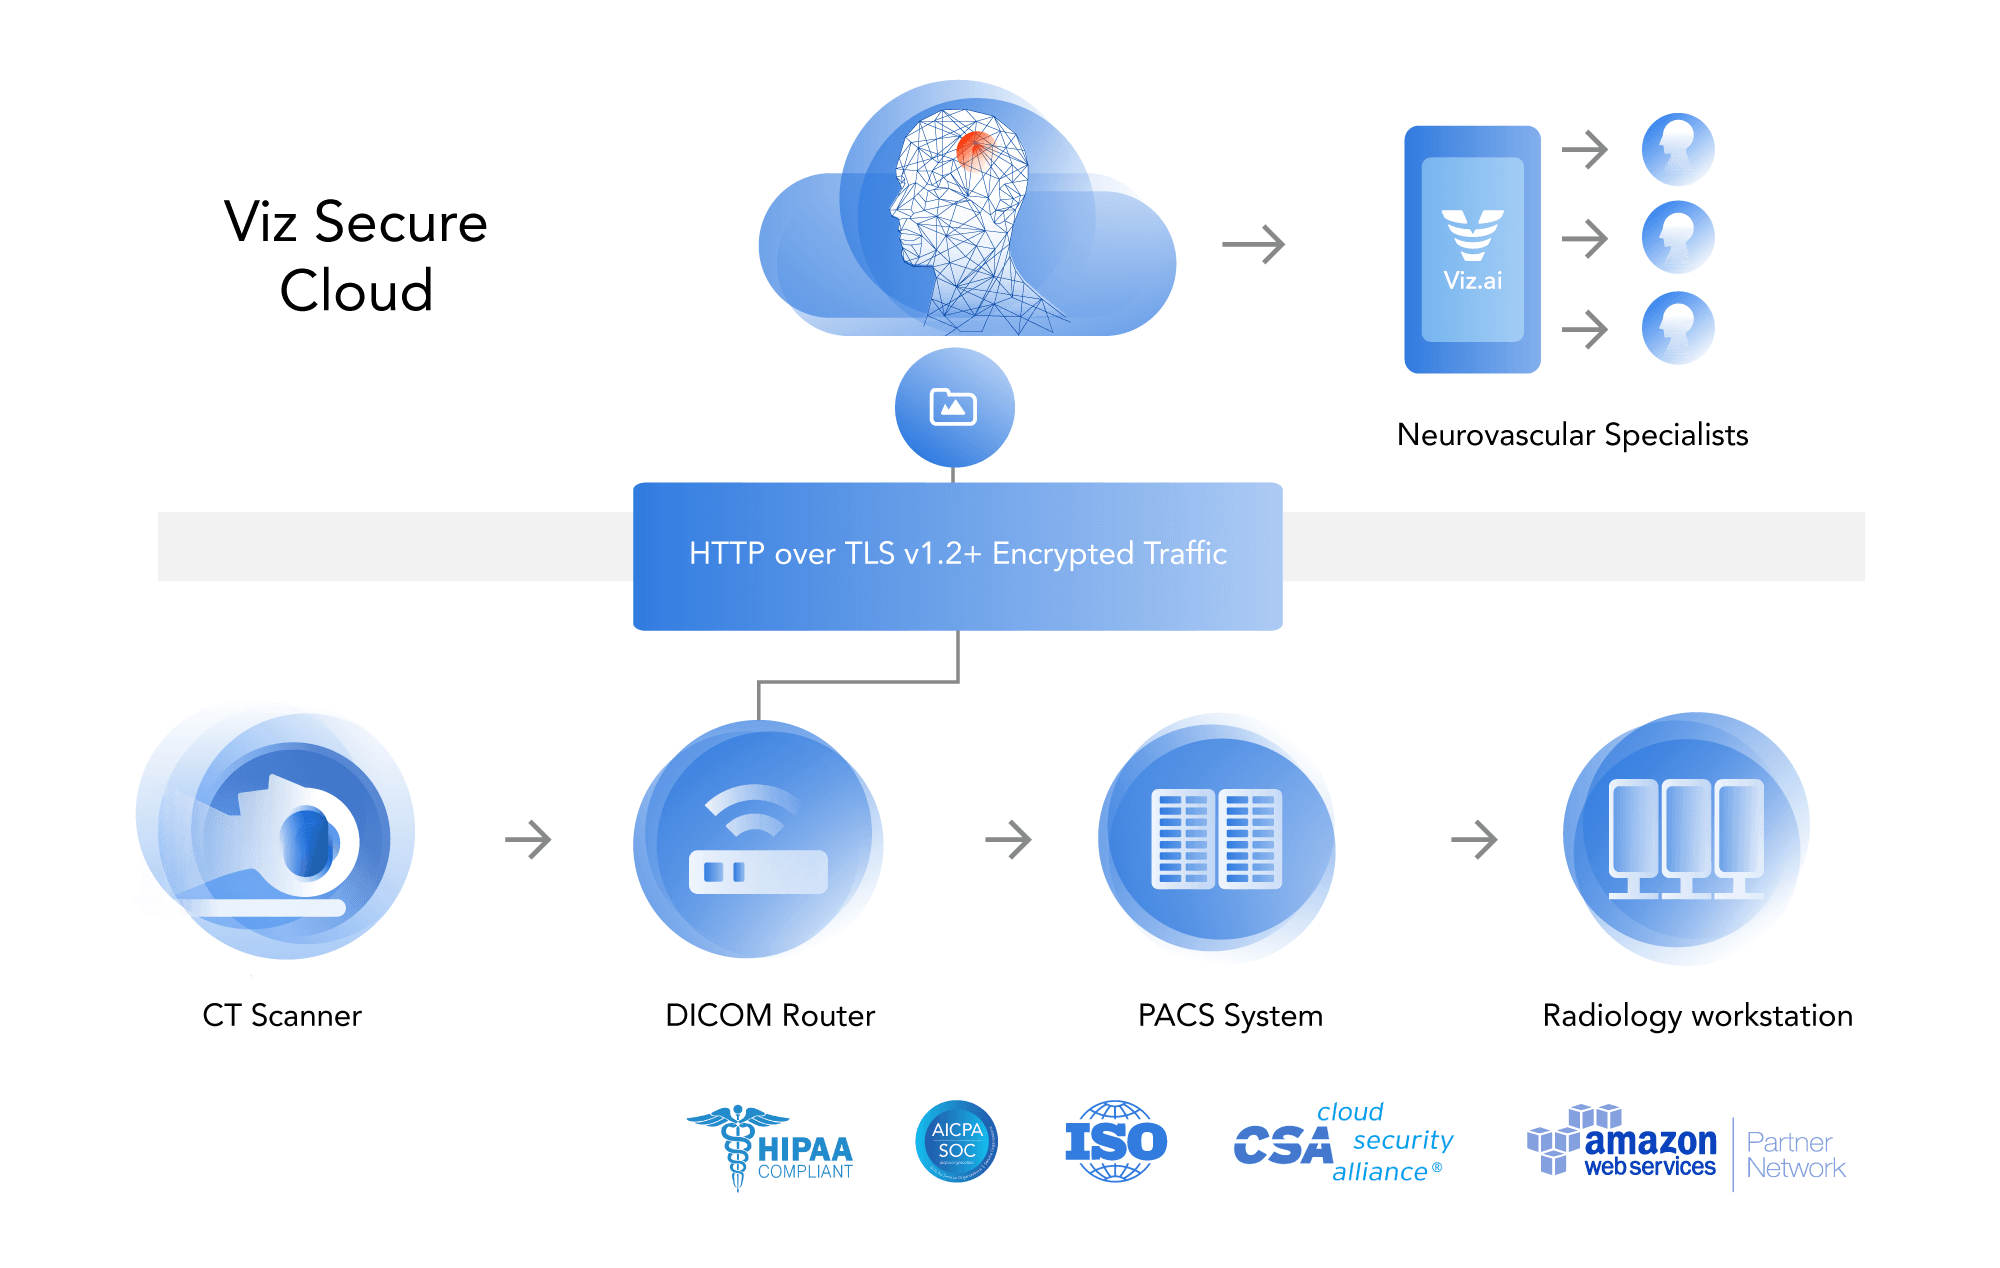 Seamless cloud integration diagram of Viz.ai